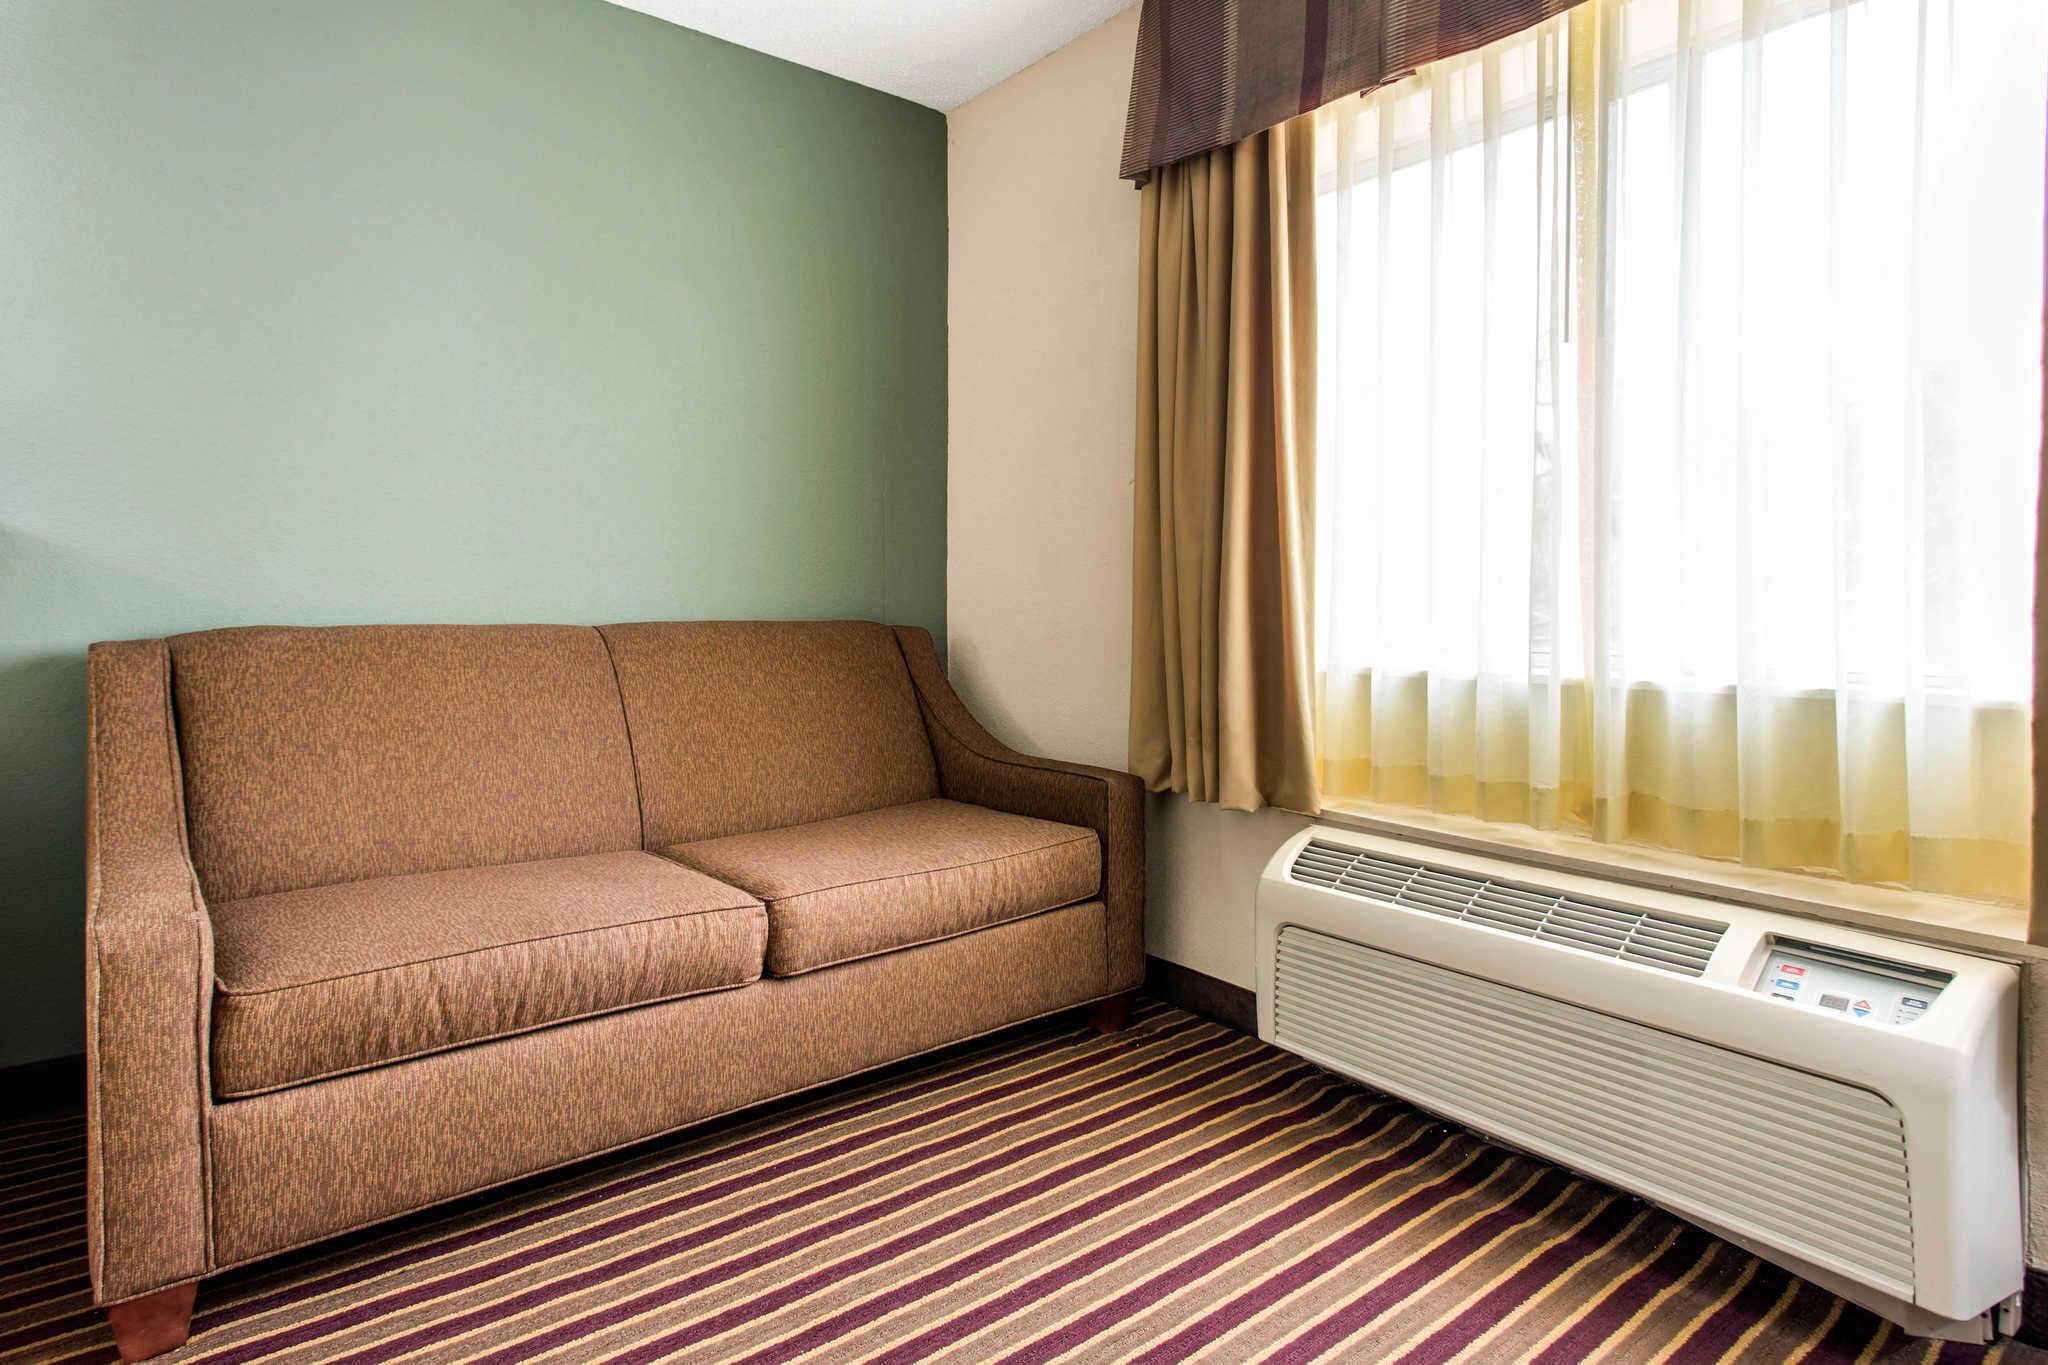 Comfort Inn & Suites Crabtree Valley image 21